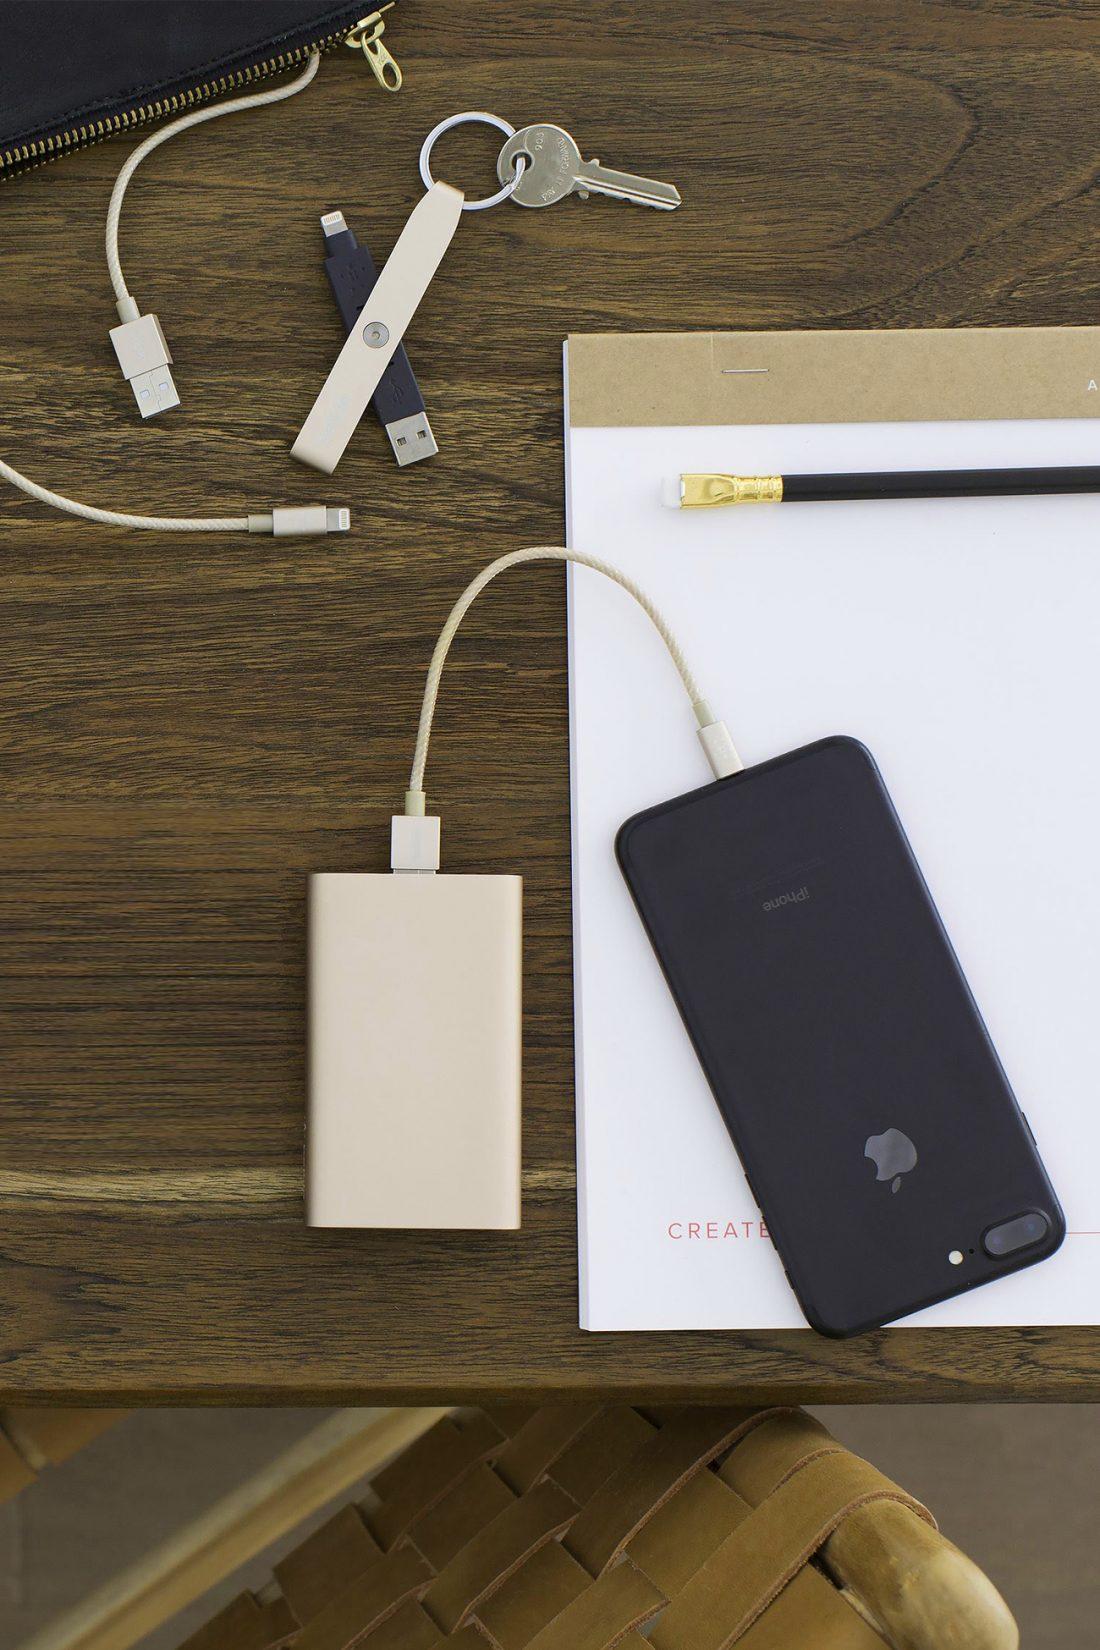 Best charging cables Belkin DuraTek Charging Cable